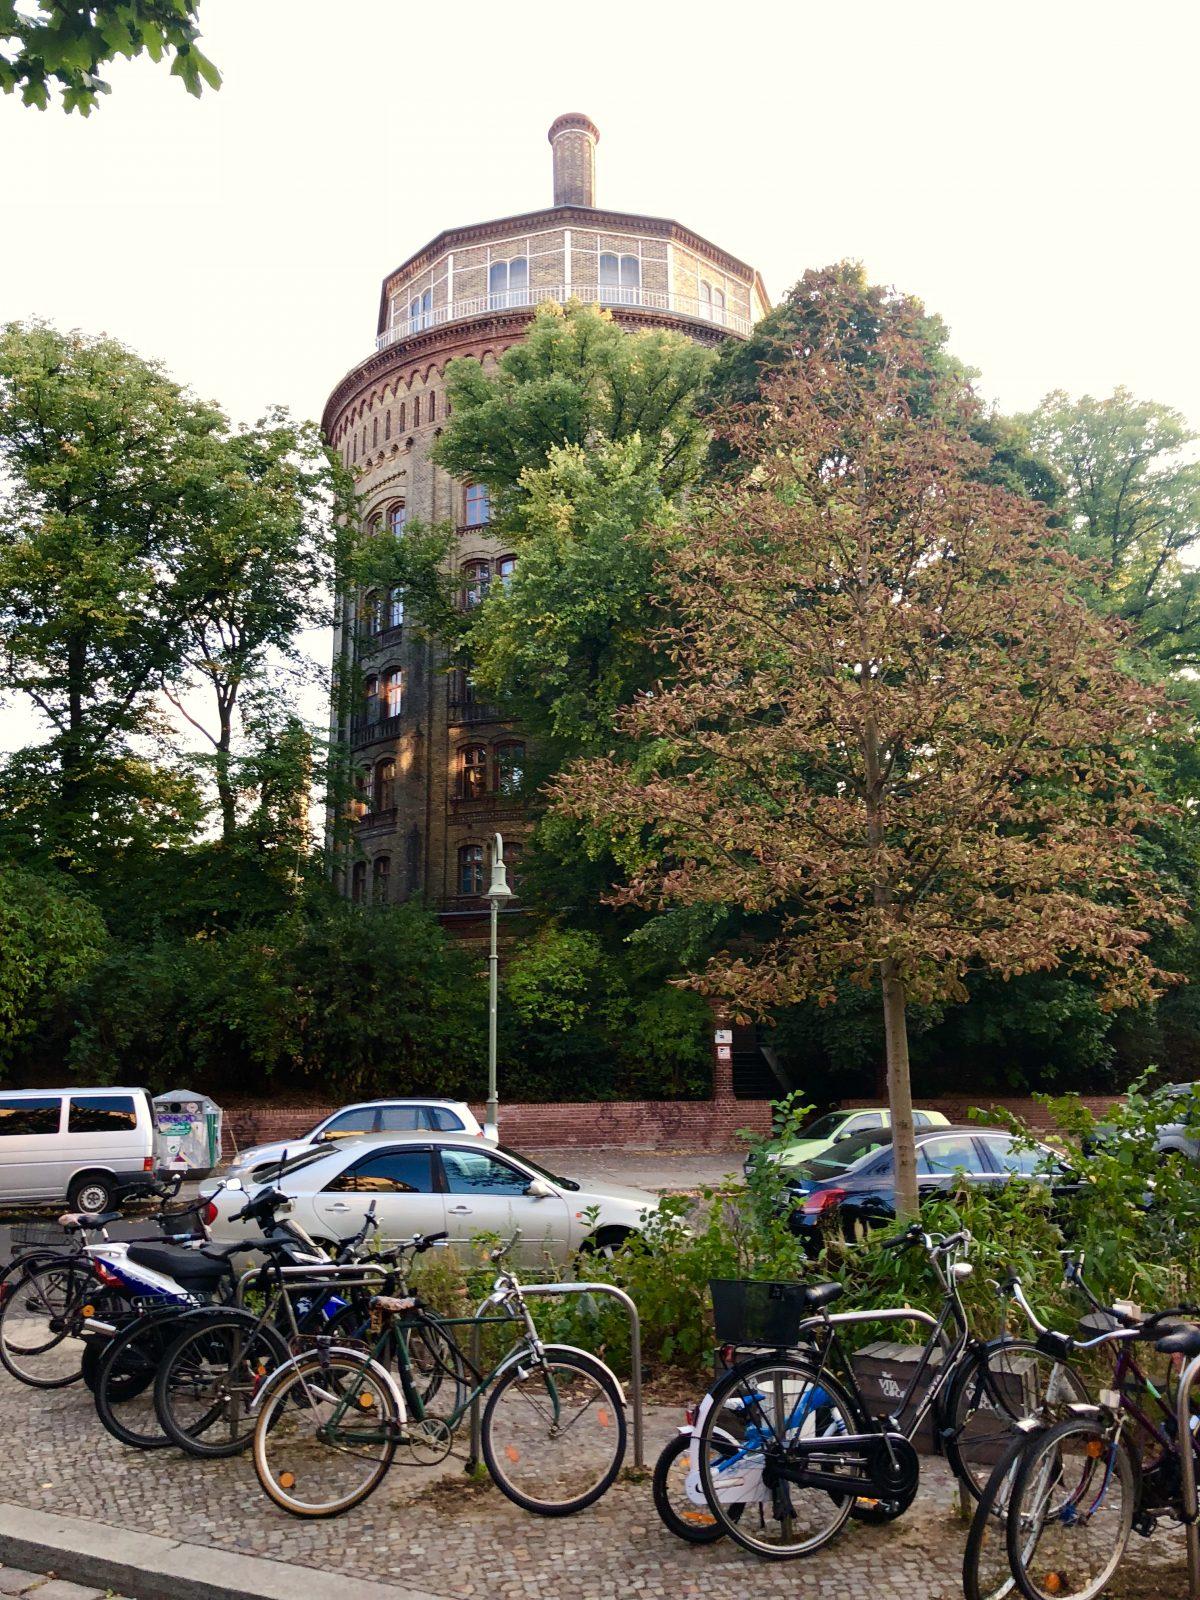 Wasserturm, Prenzlauer Berg | berlinmittemom.com